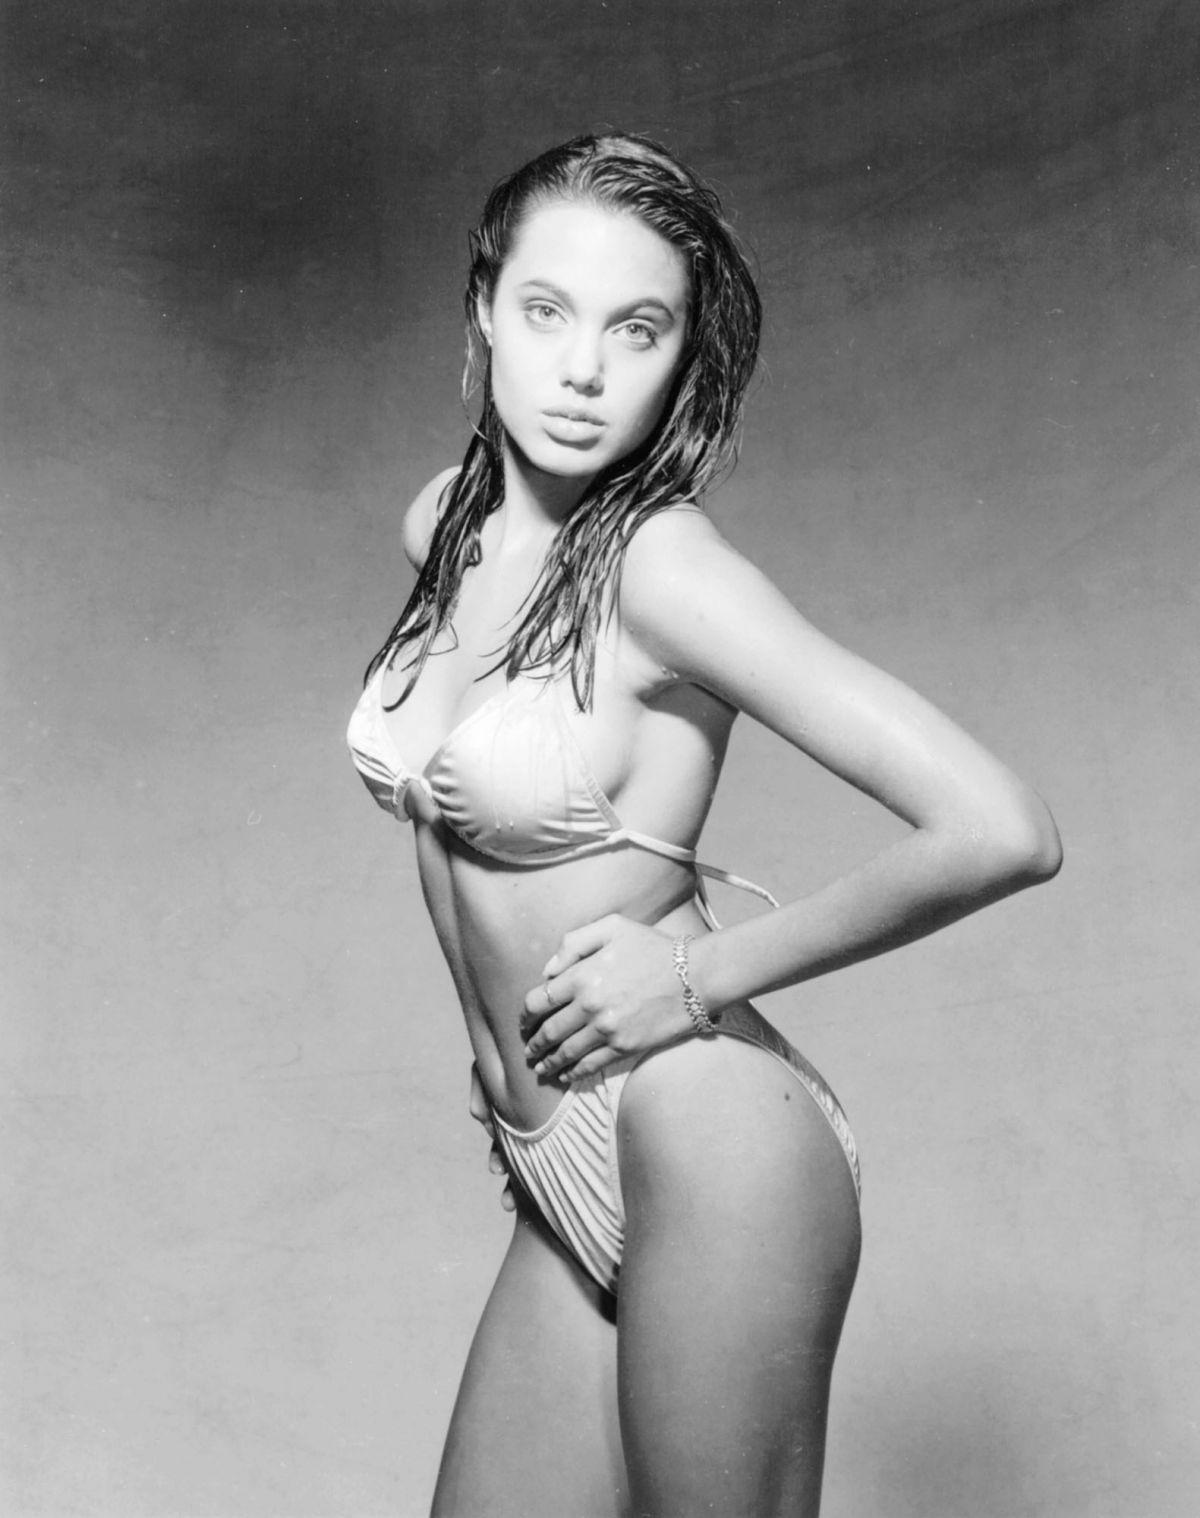 hot naked fucked video punjabi girl